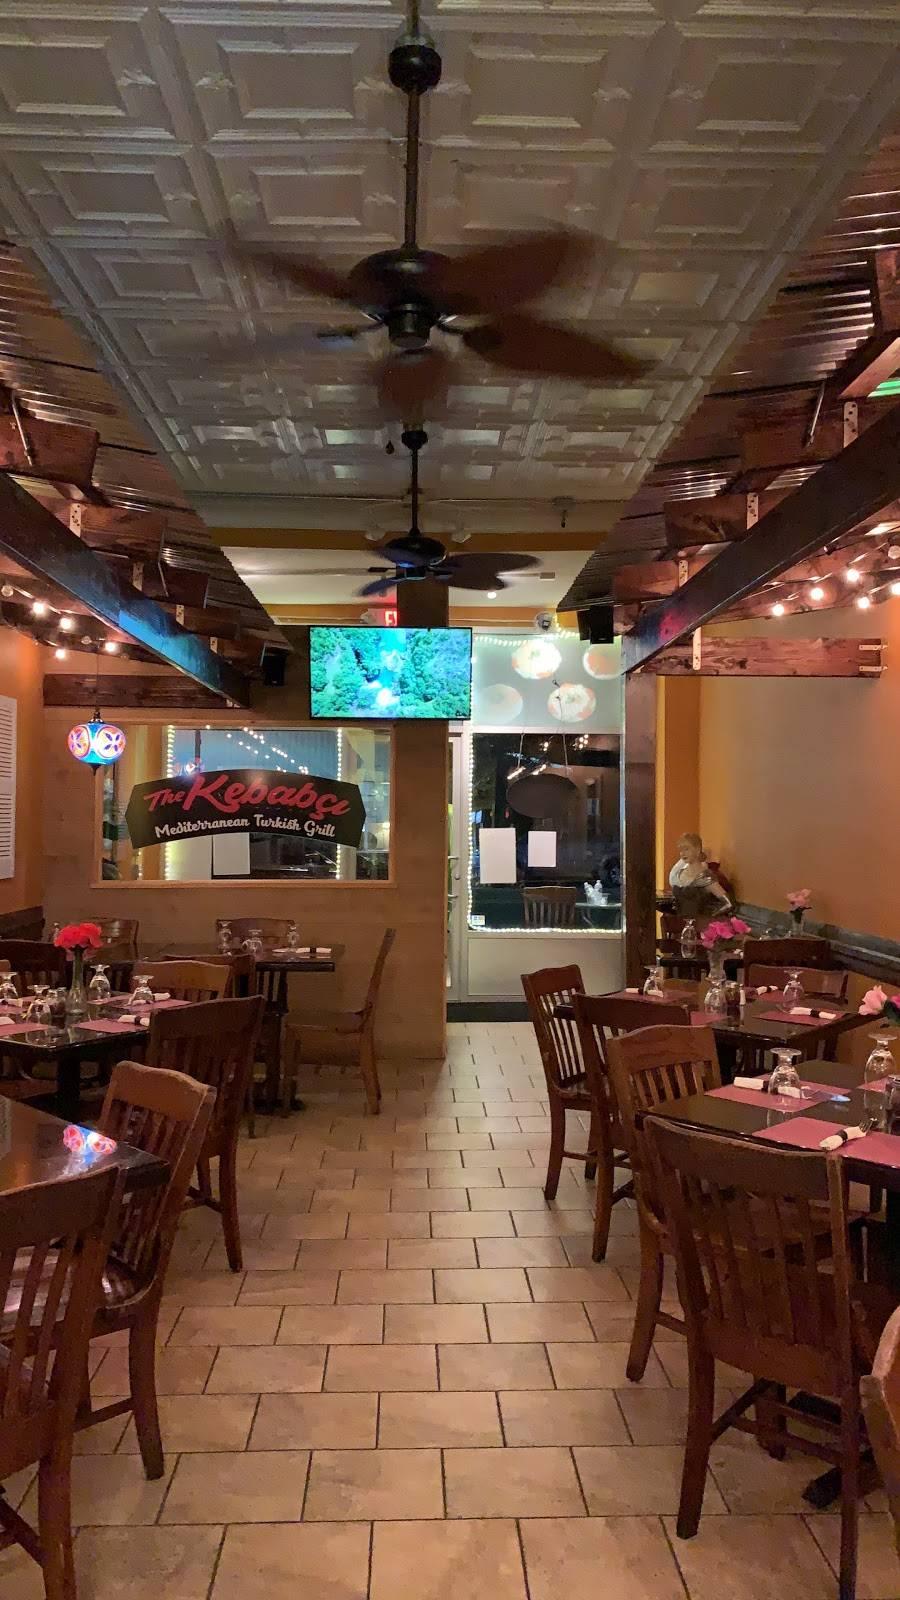 The Kebabci | restaurant | 259 Valley Blvd, Wood-Ridge, NJ 07075, USA | 2017284949 OR +1 201-728-4949